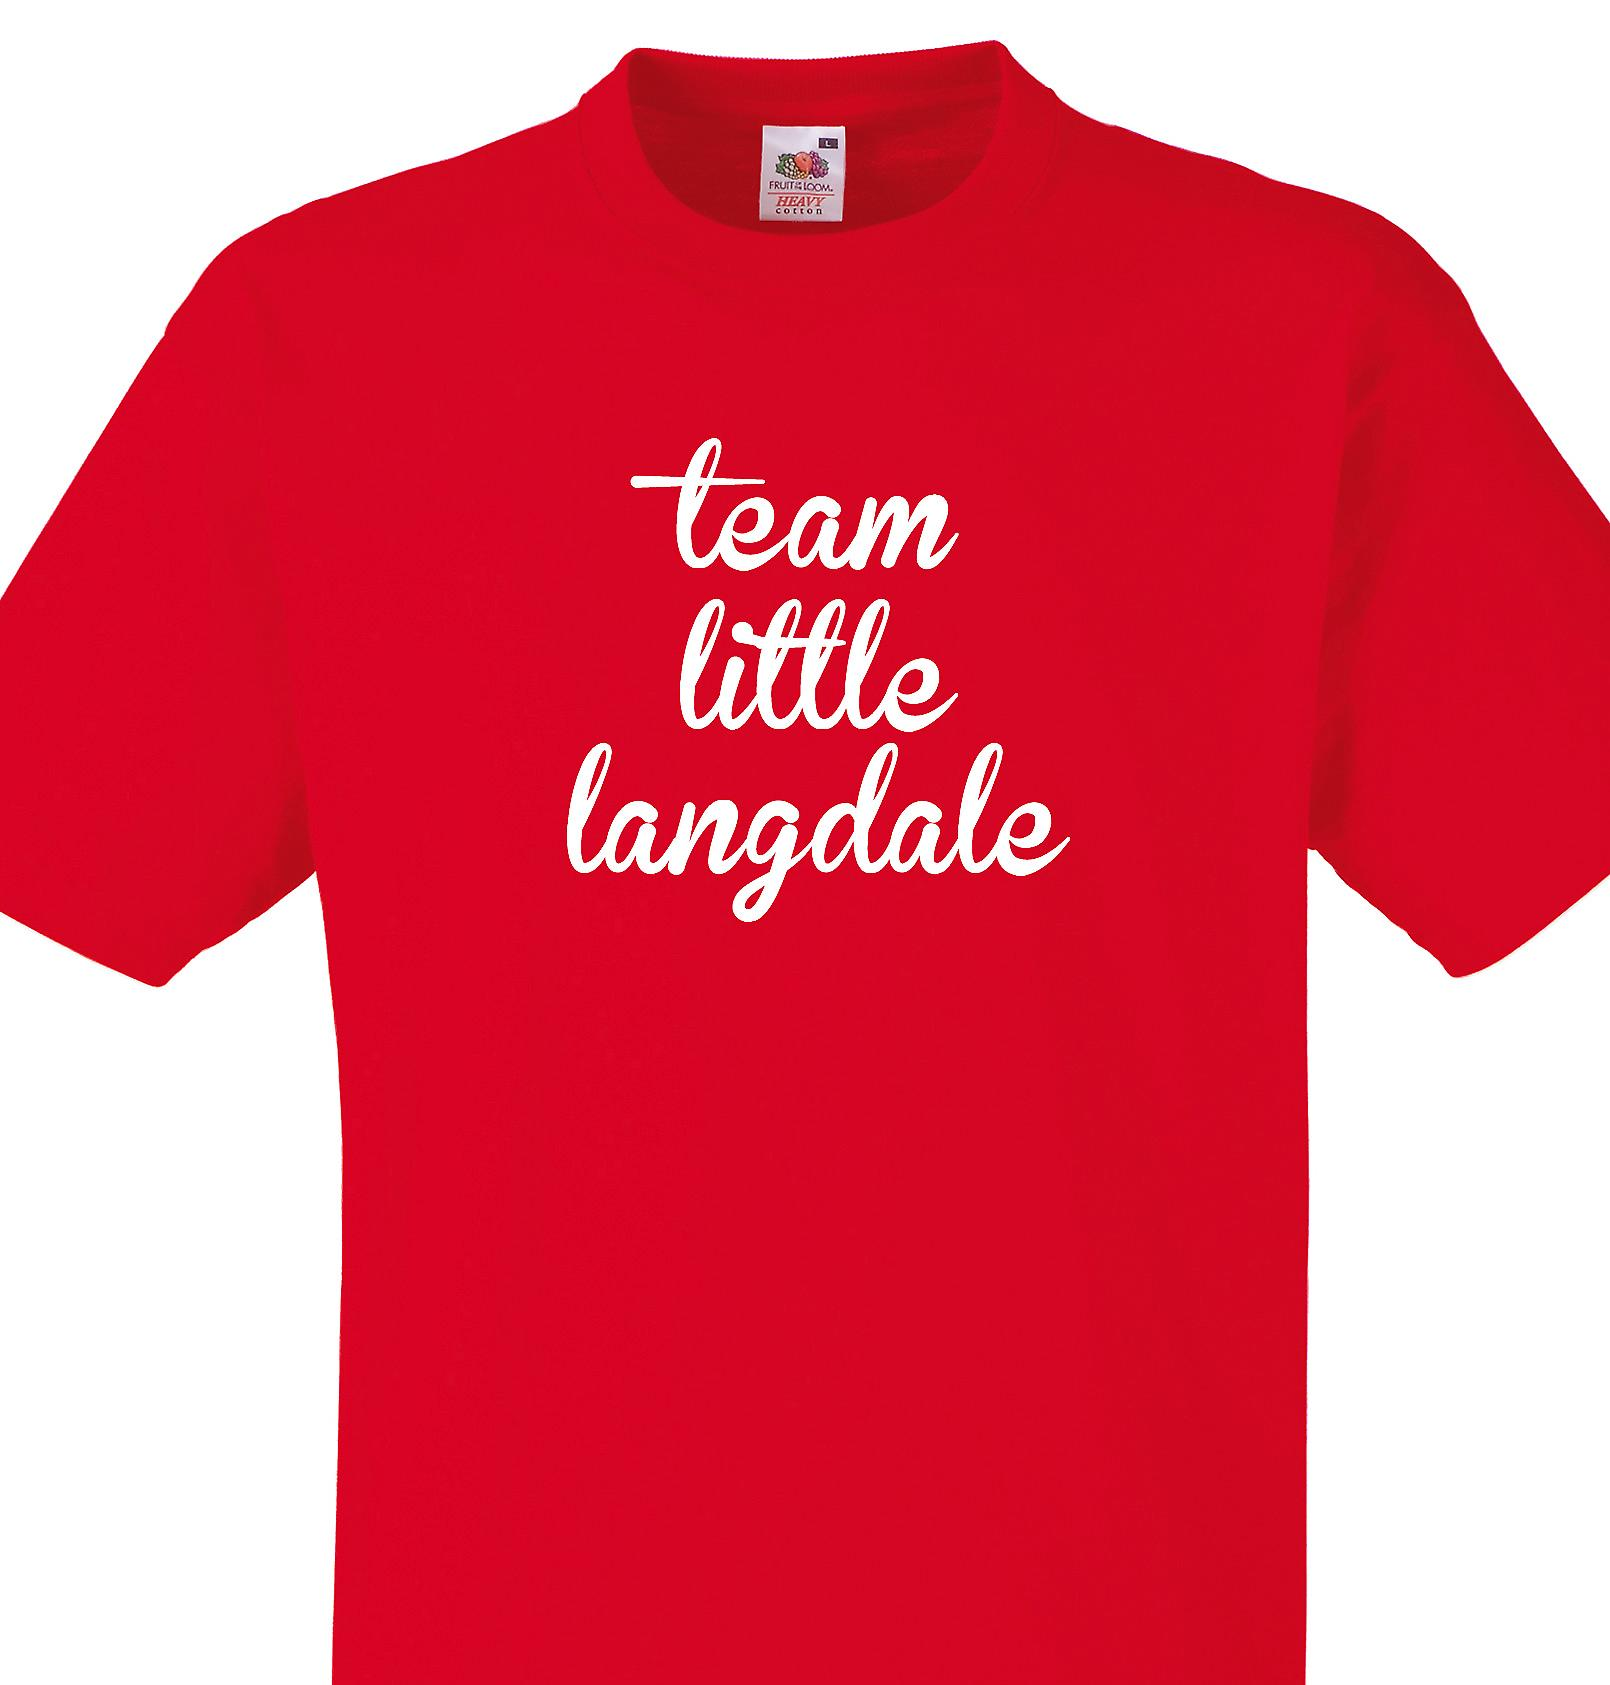 Team Little langdale Red T shirt